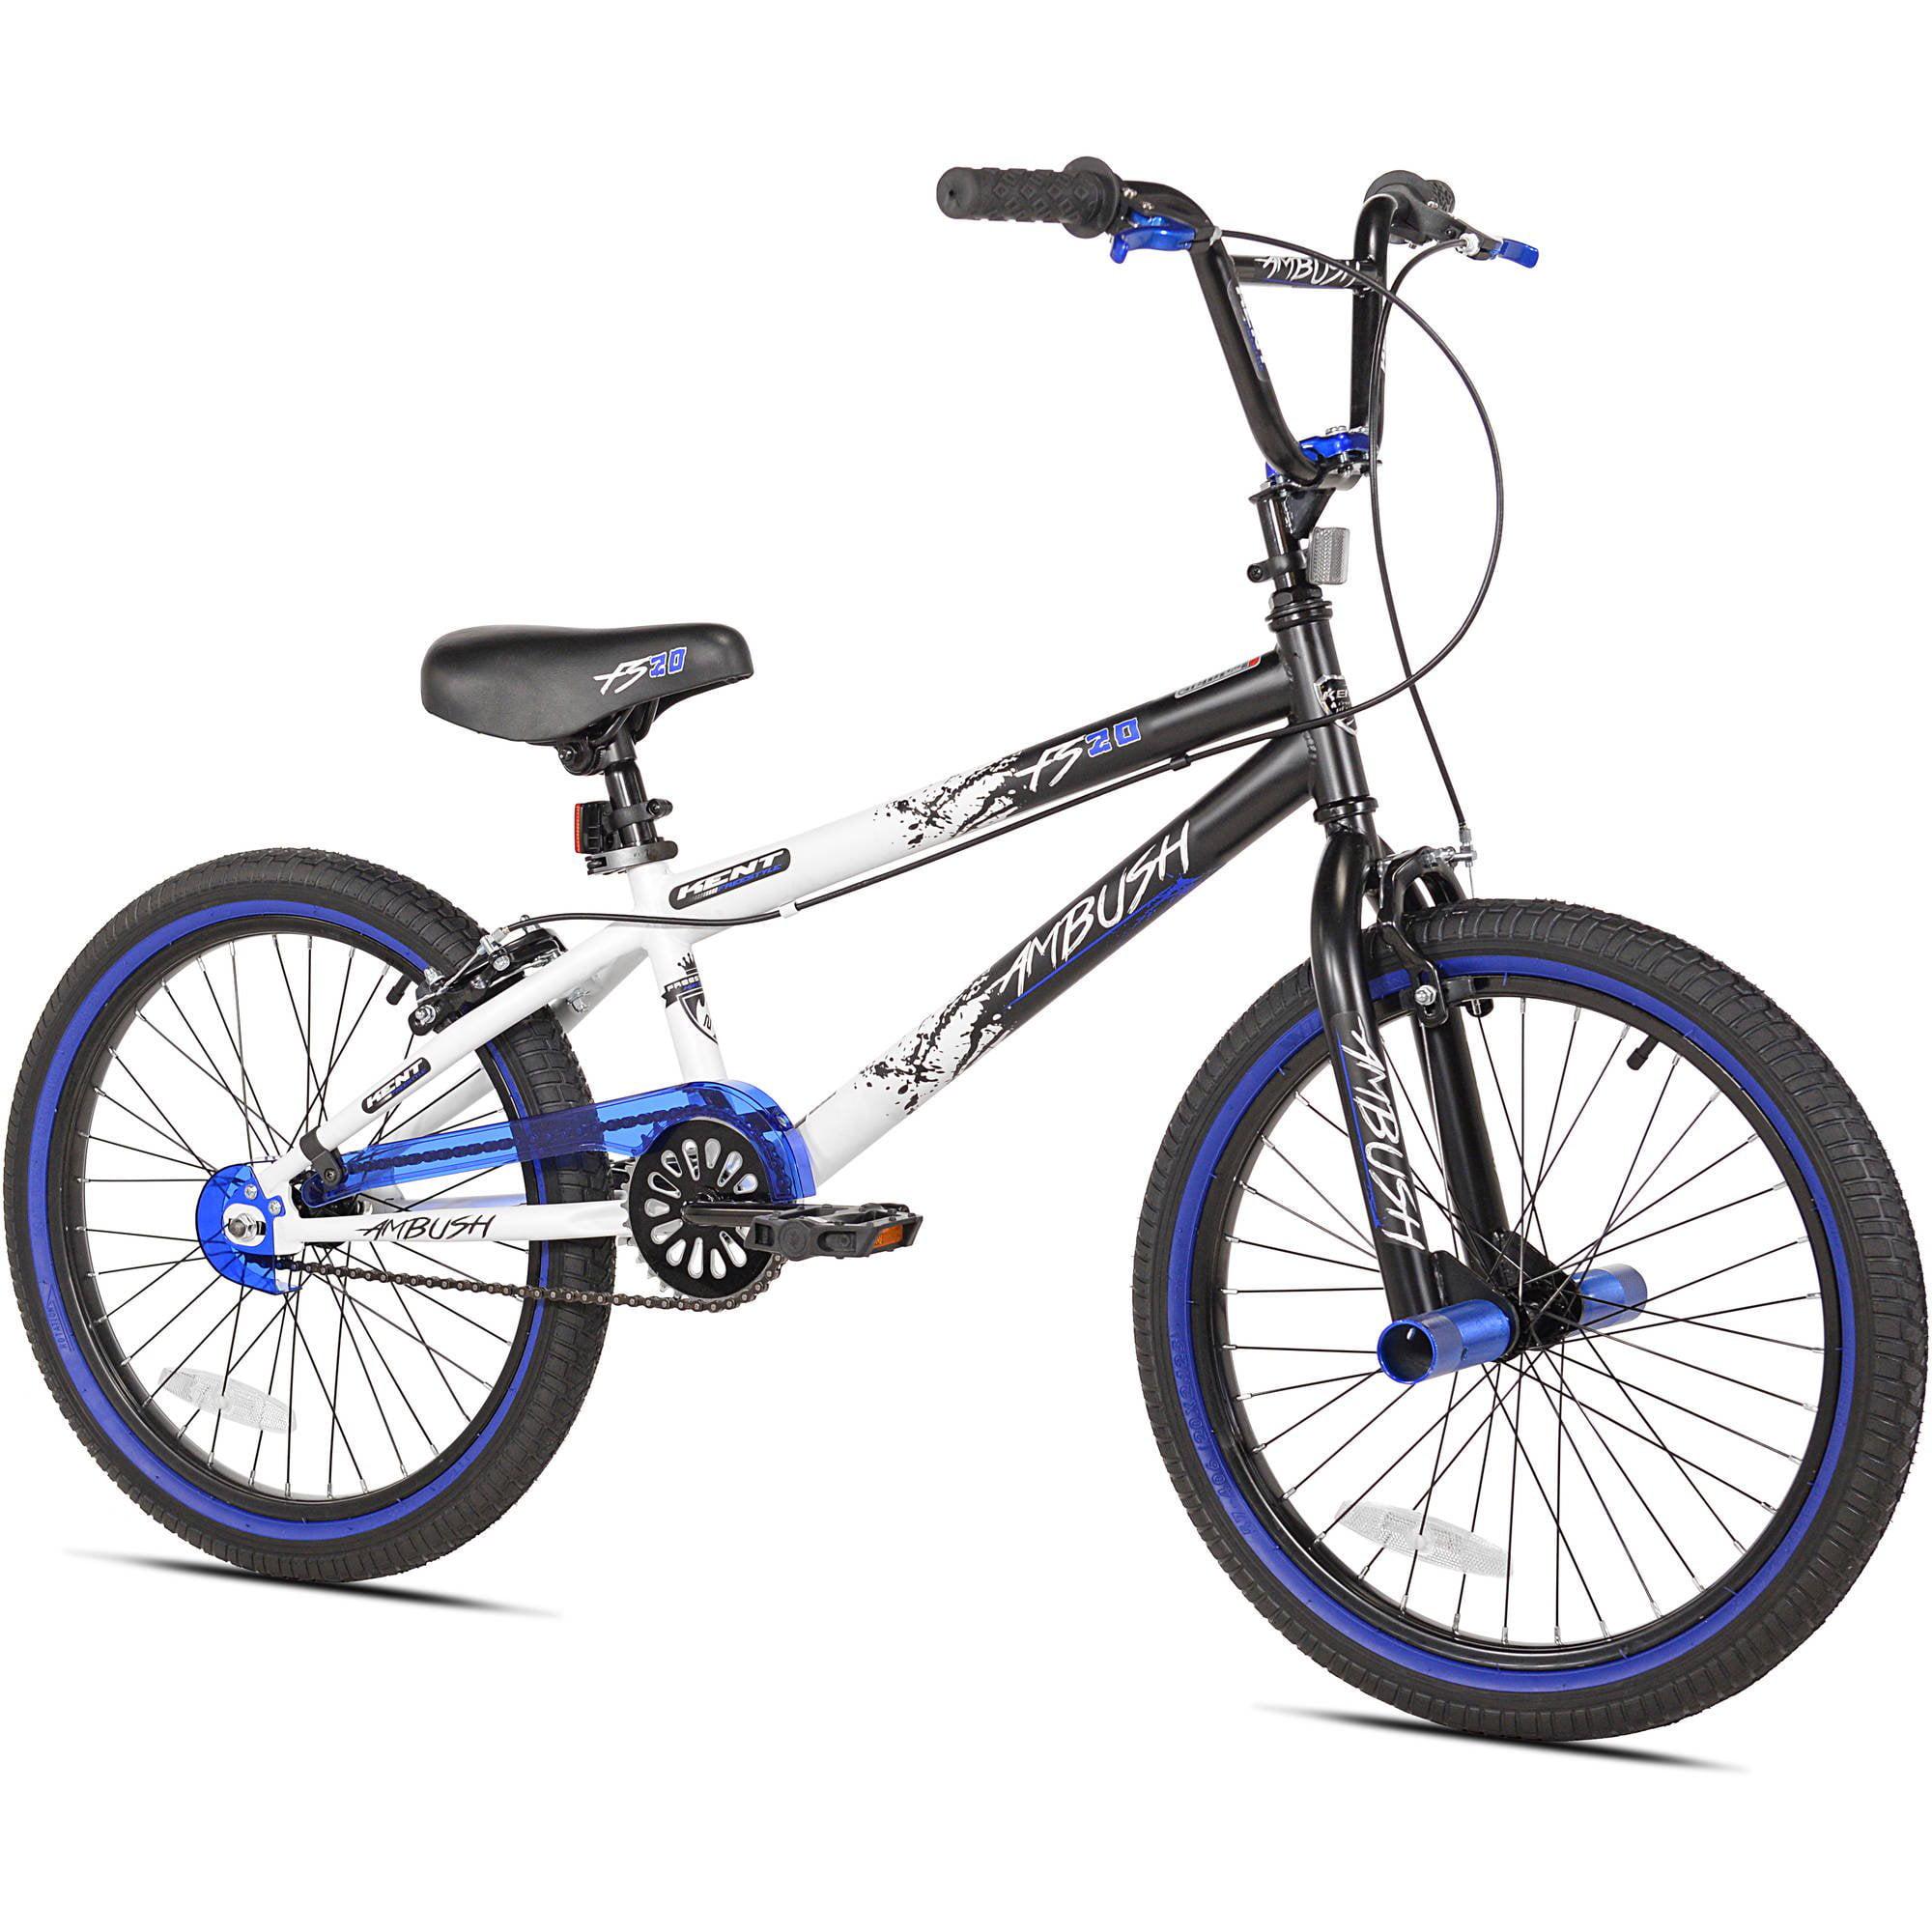 "Ambush BMX Bike Kent 20/"" Boys/' For Ages 8-12 Blue"